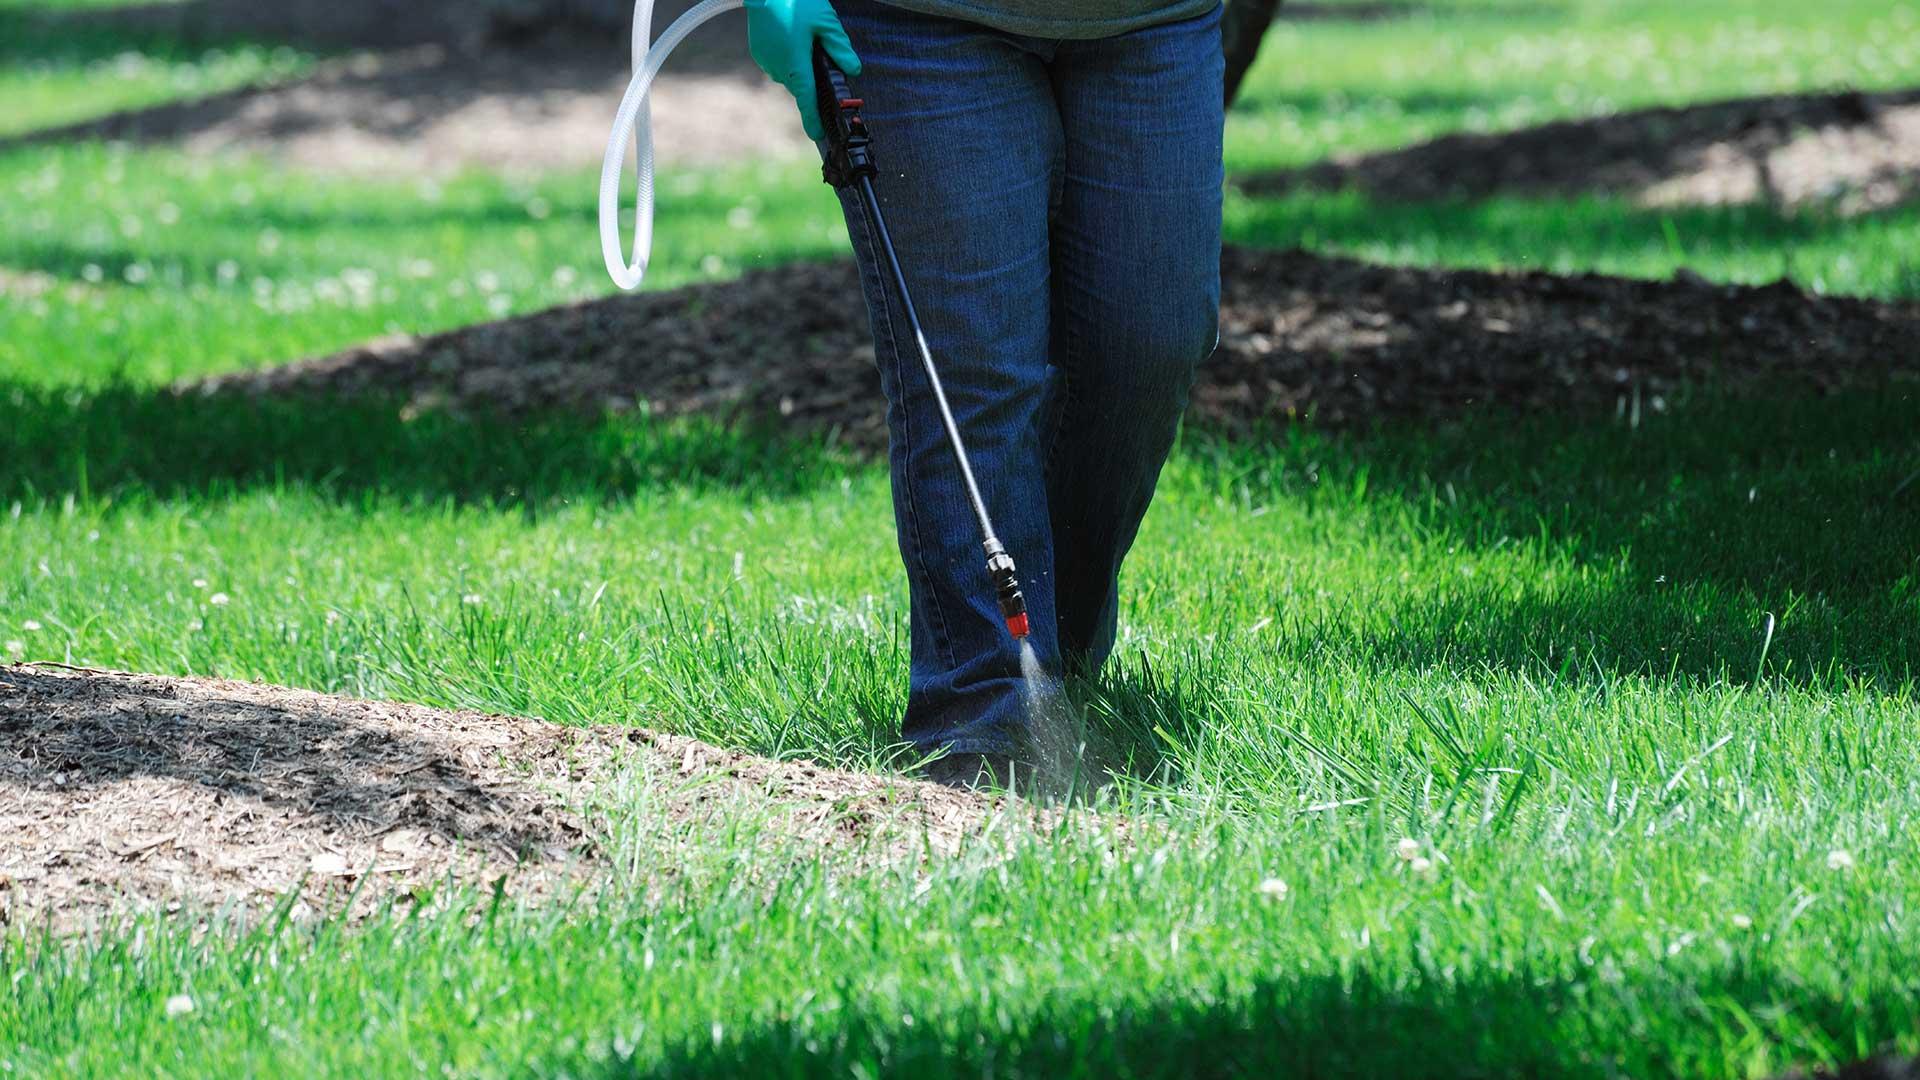 Using a Pre-Emergent Herbicide